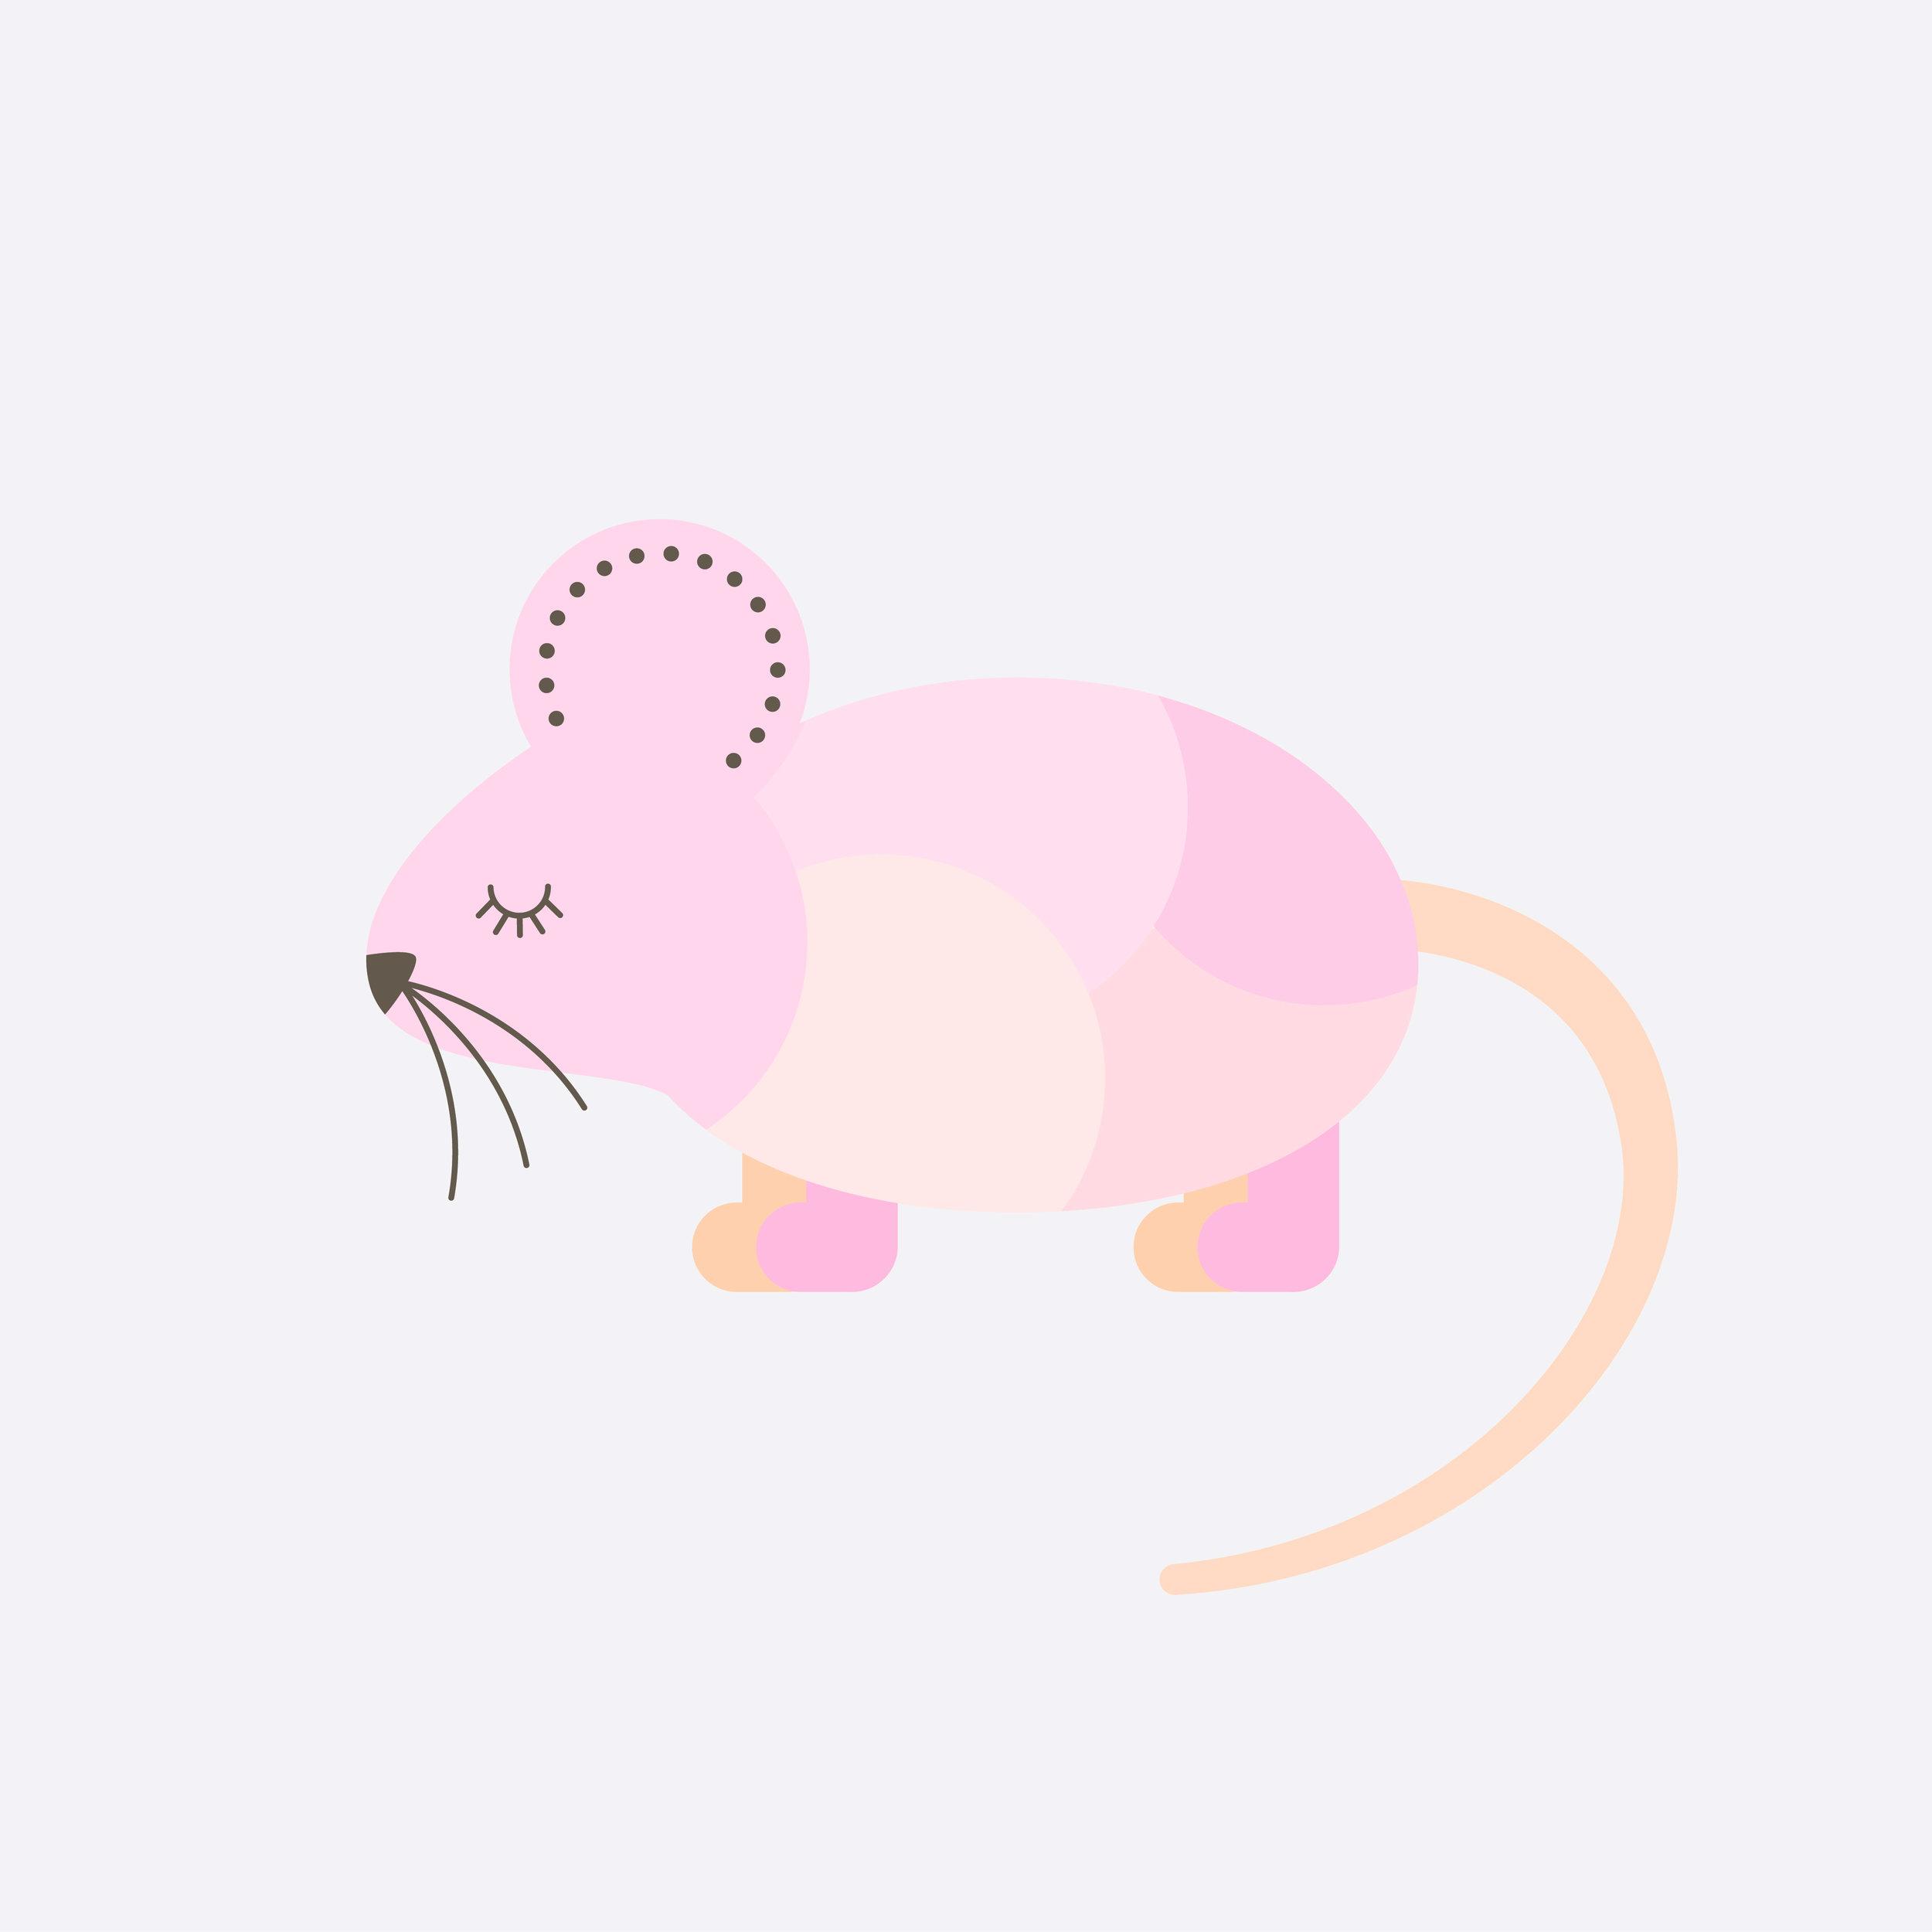 mouse-57.jpg